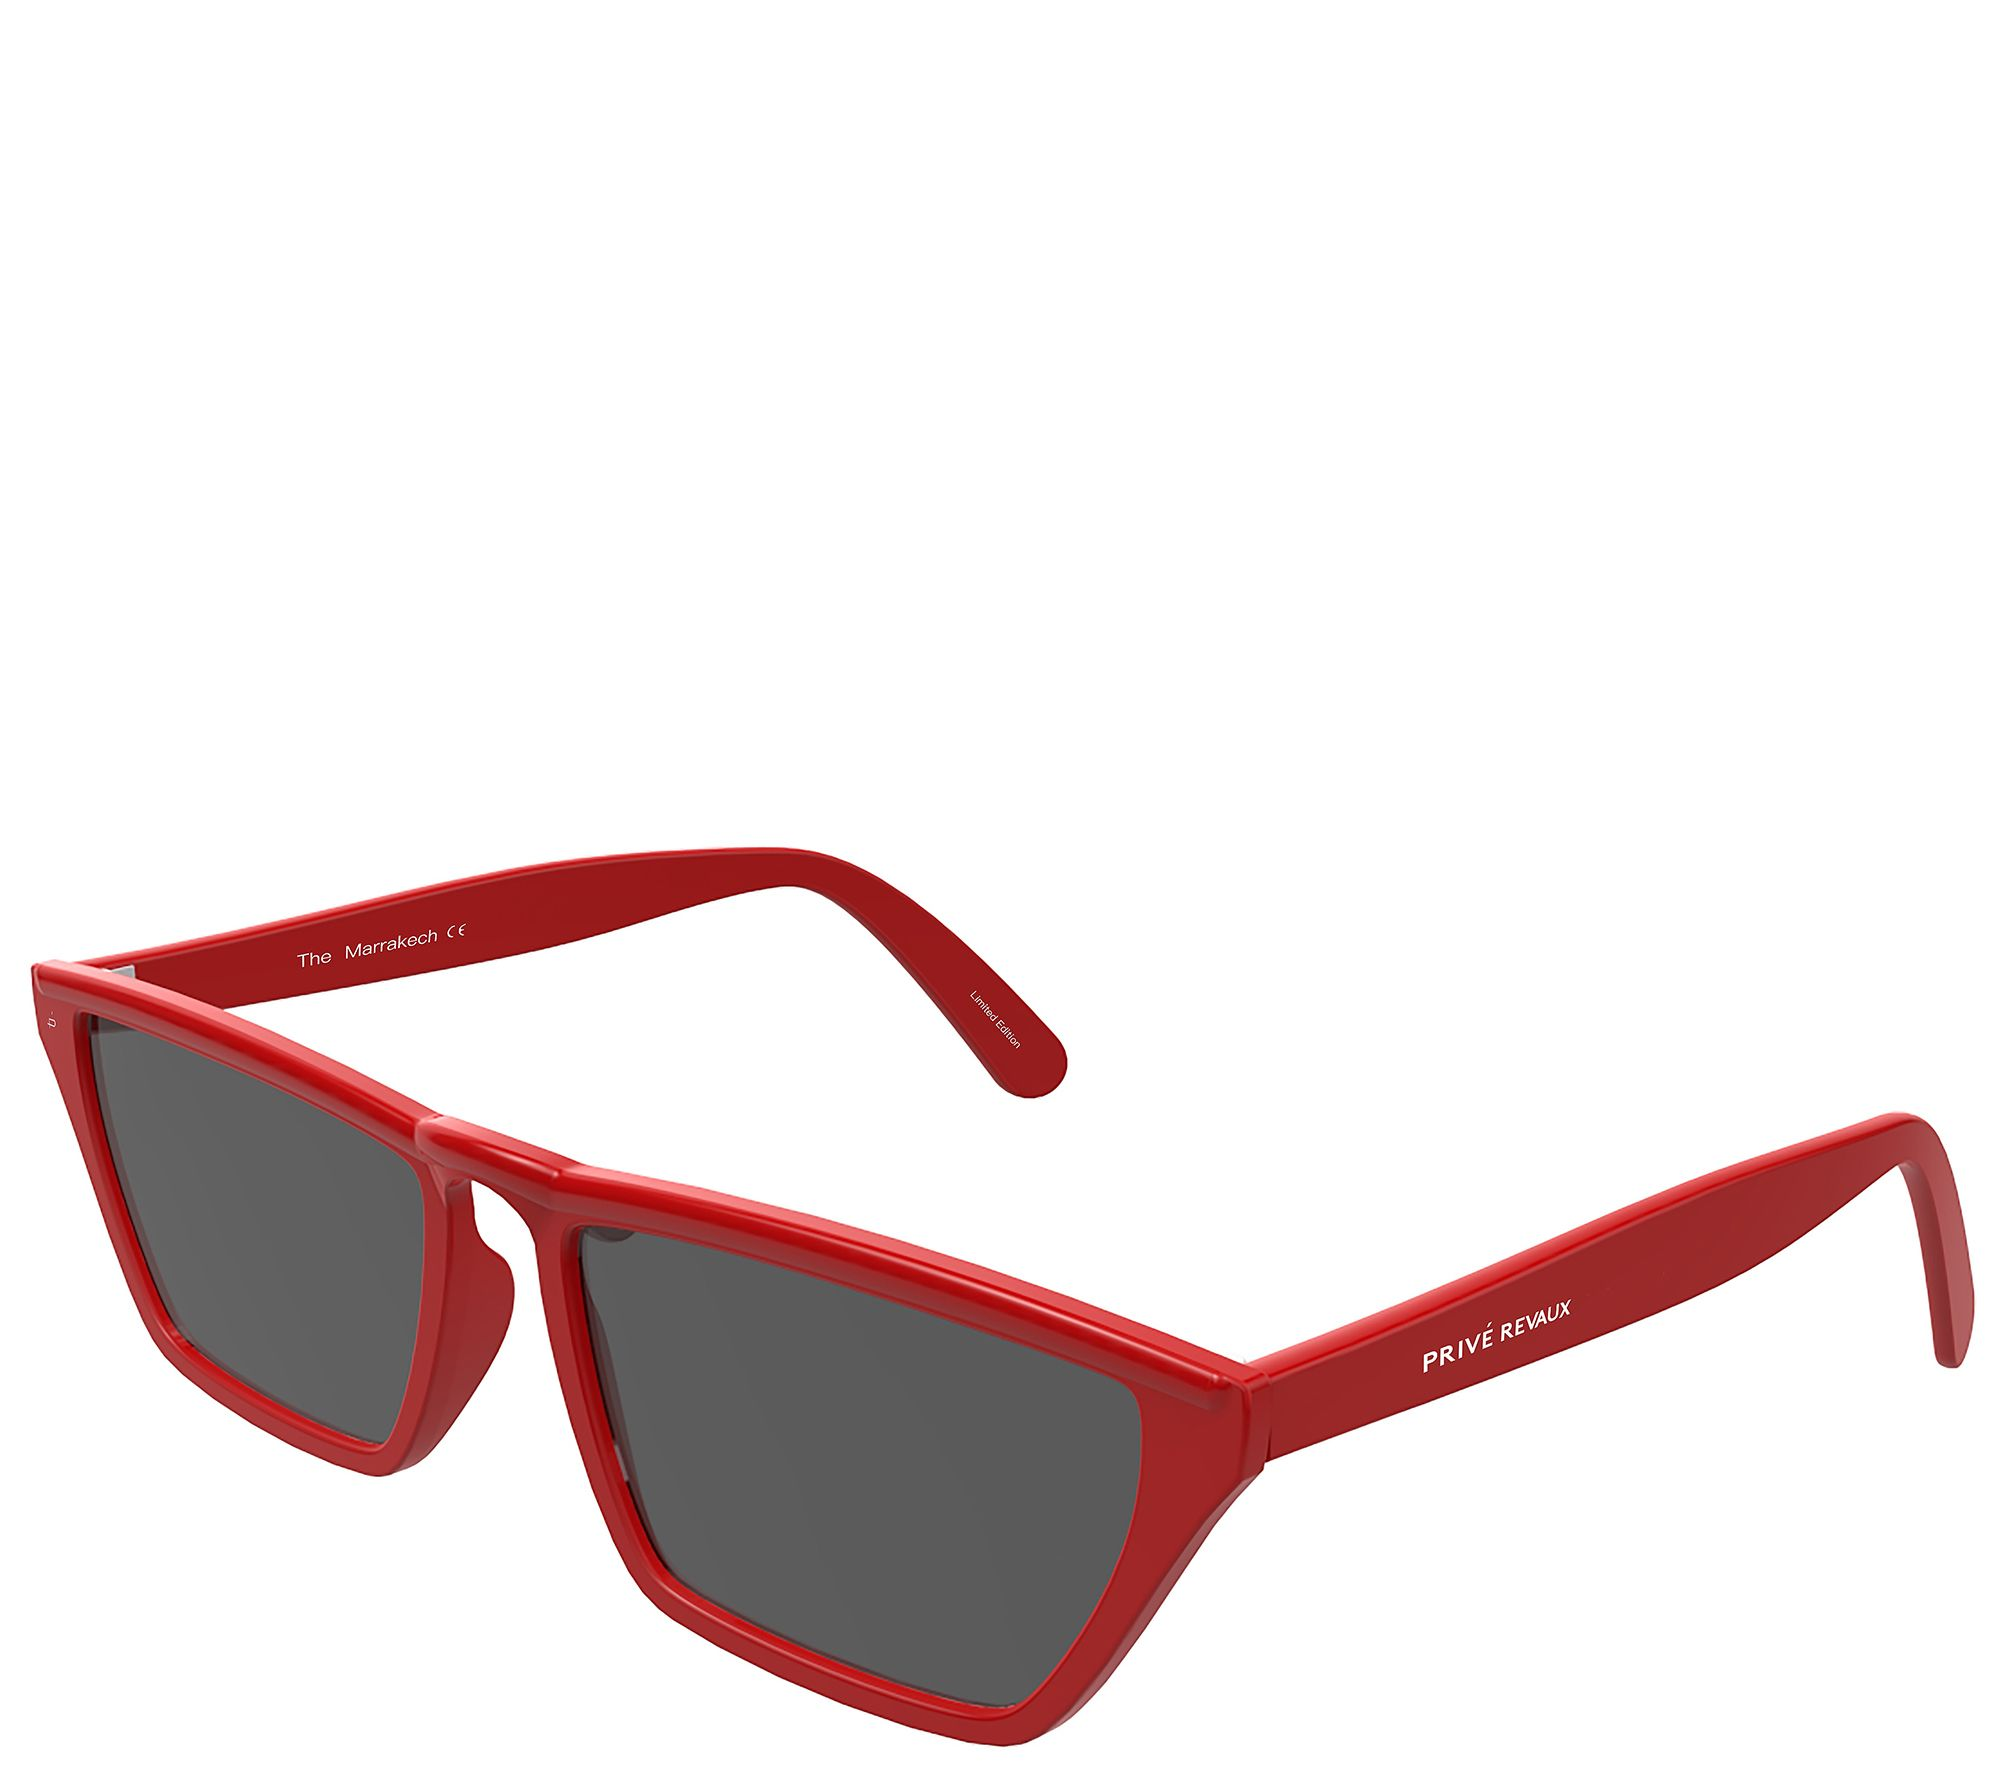 115d85dea6c Prive Revaux The Marrakech Polarized Sunglasses- Red Gray - Page 1 ...